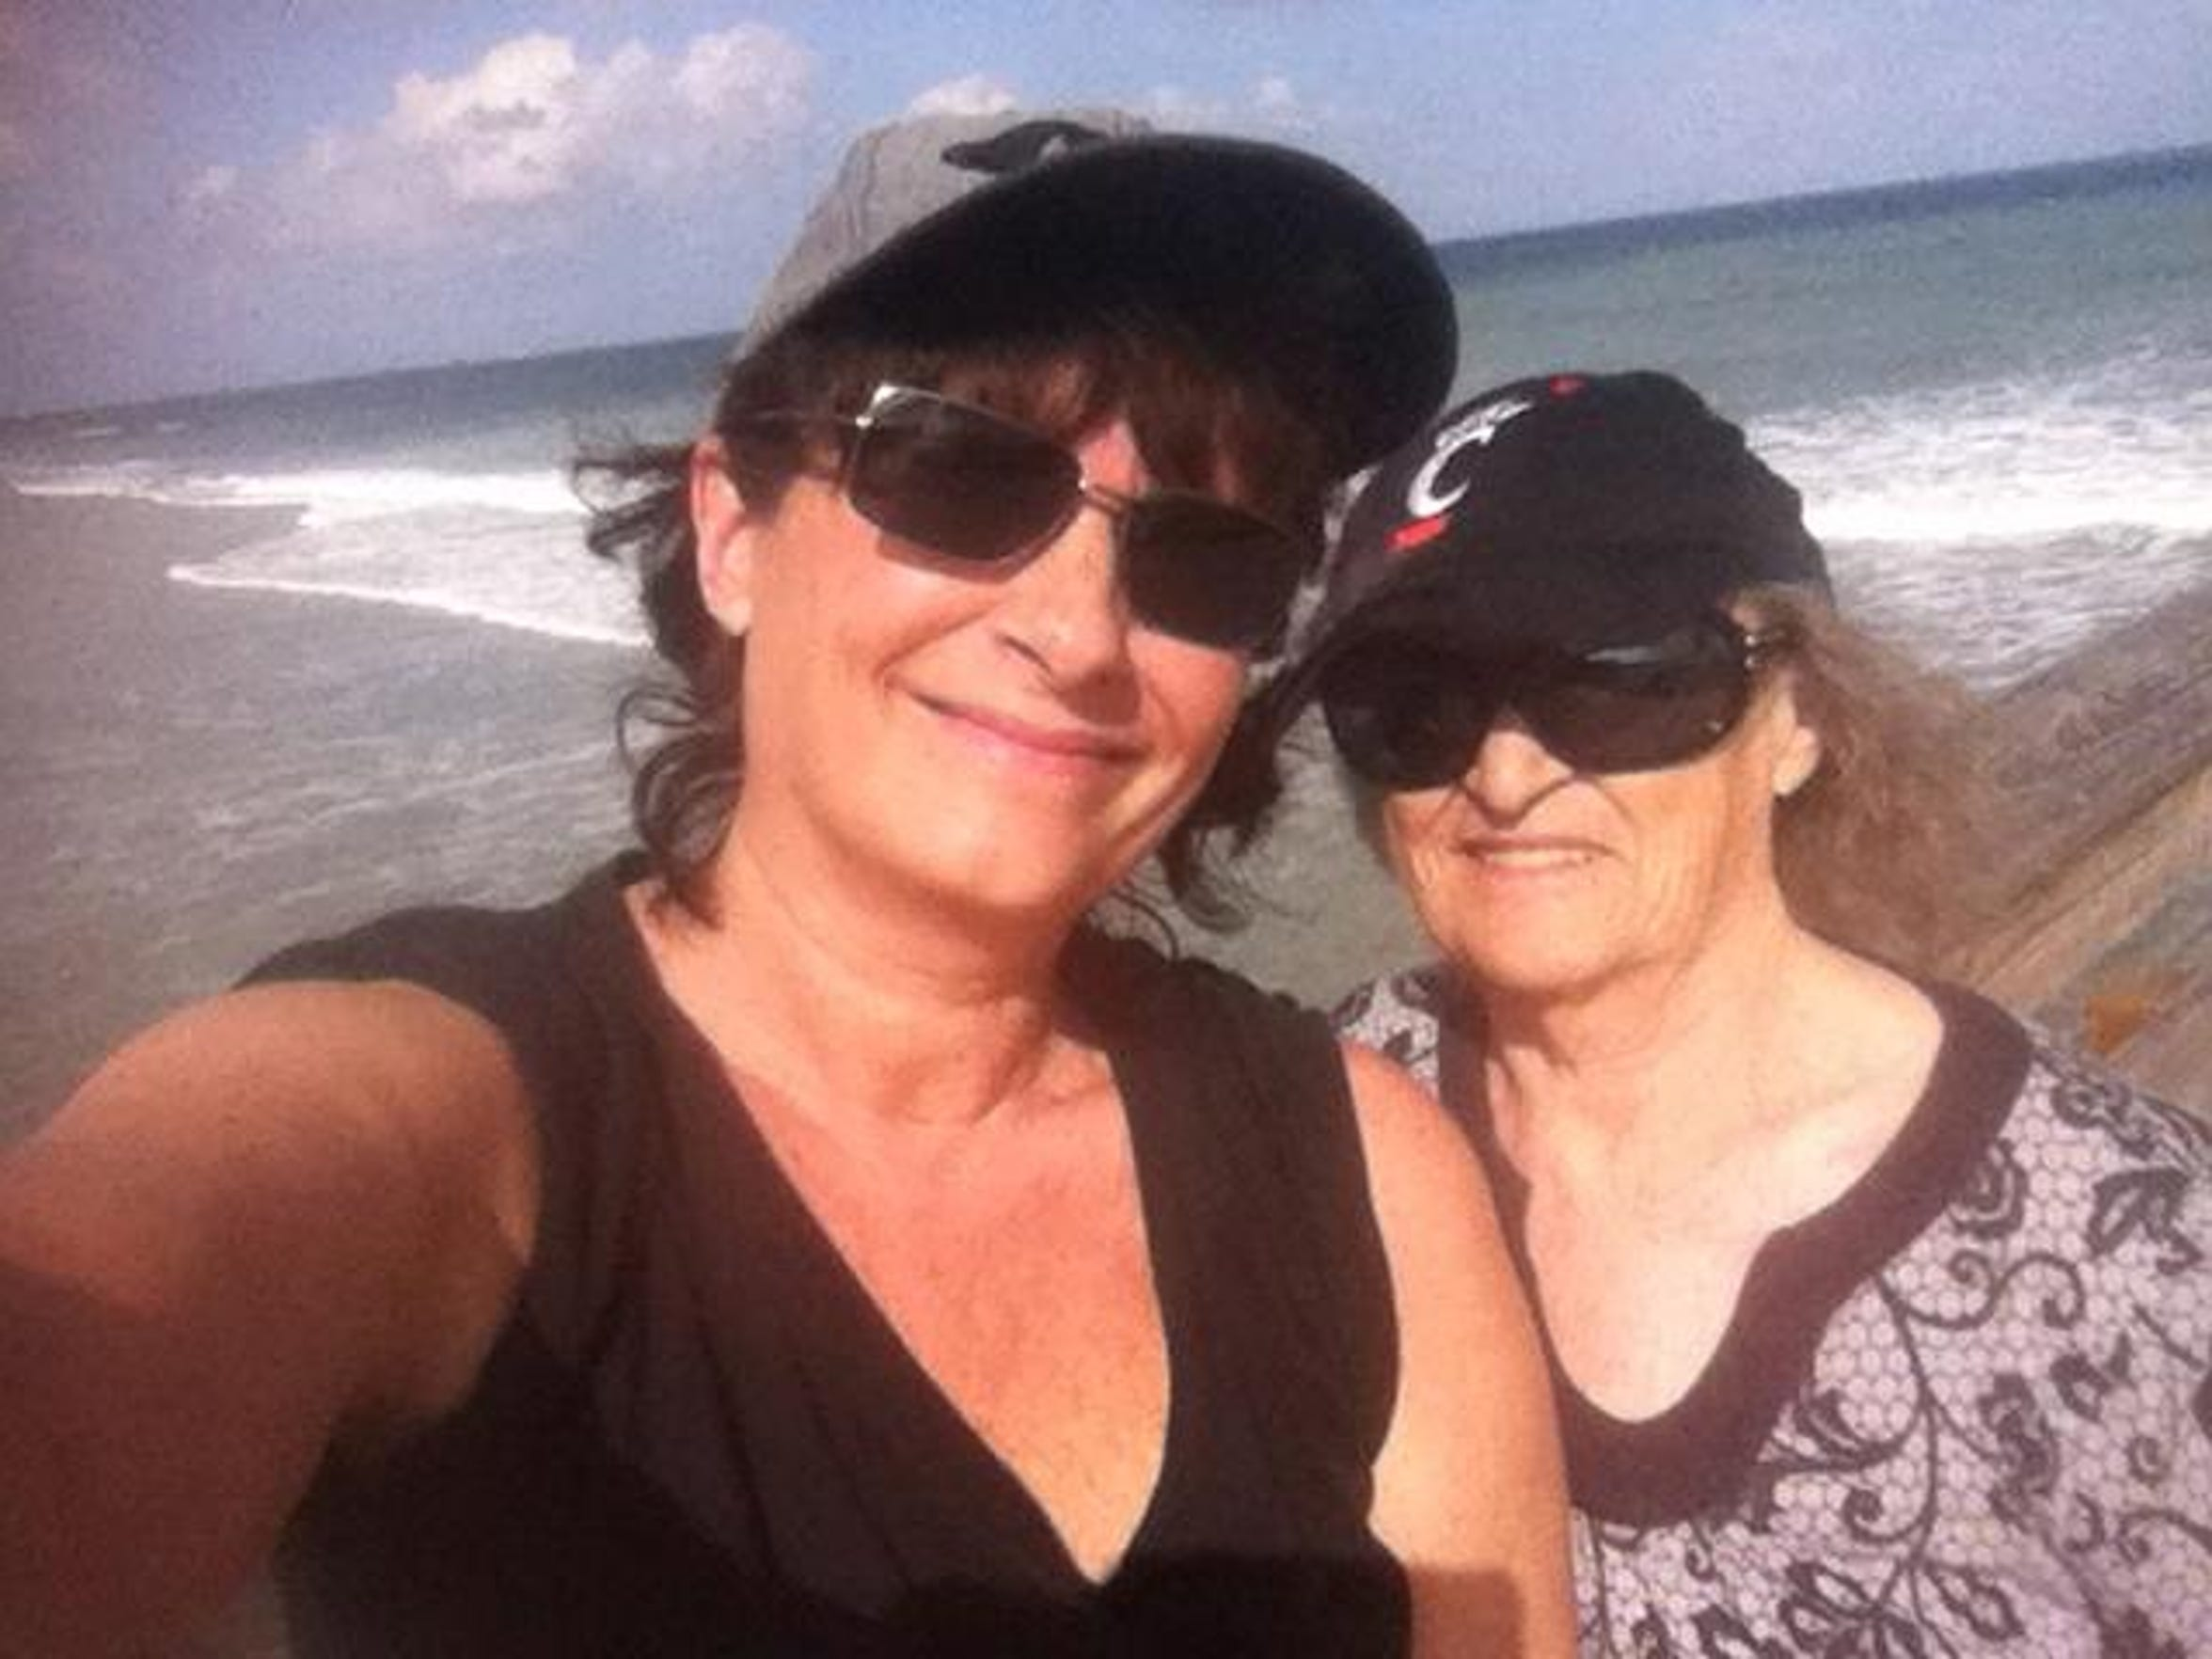 Britt Kennerly and her mother, Helen, take a selfie